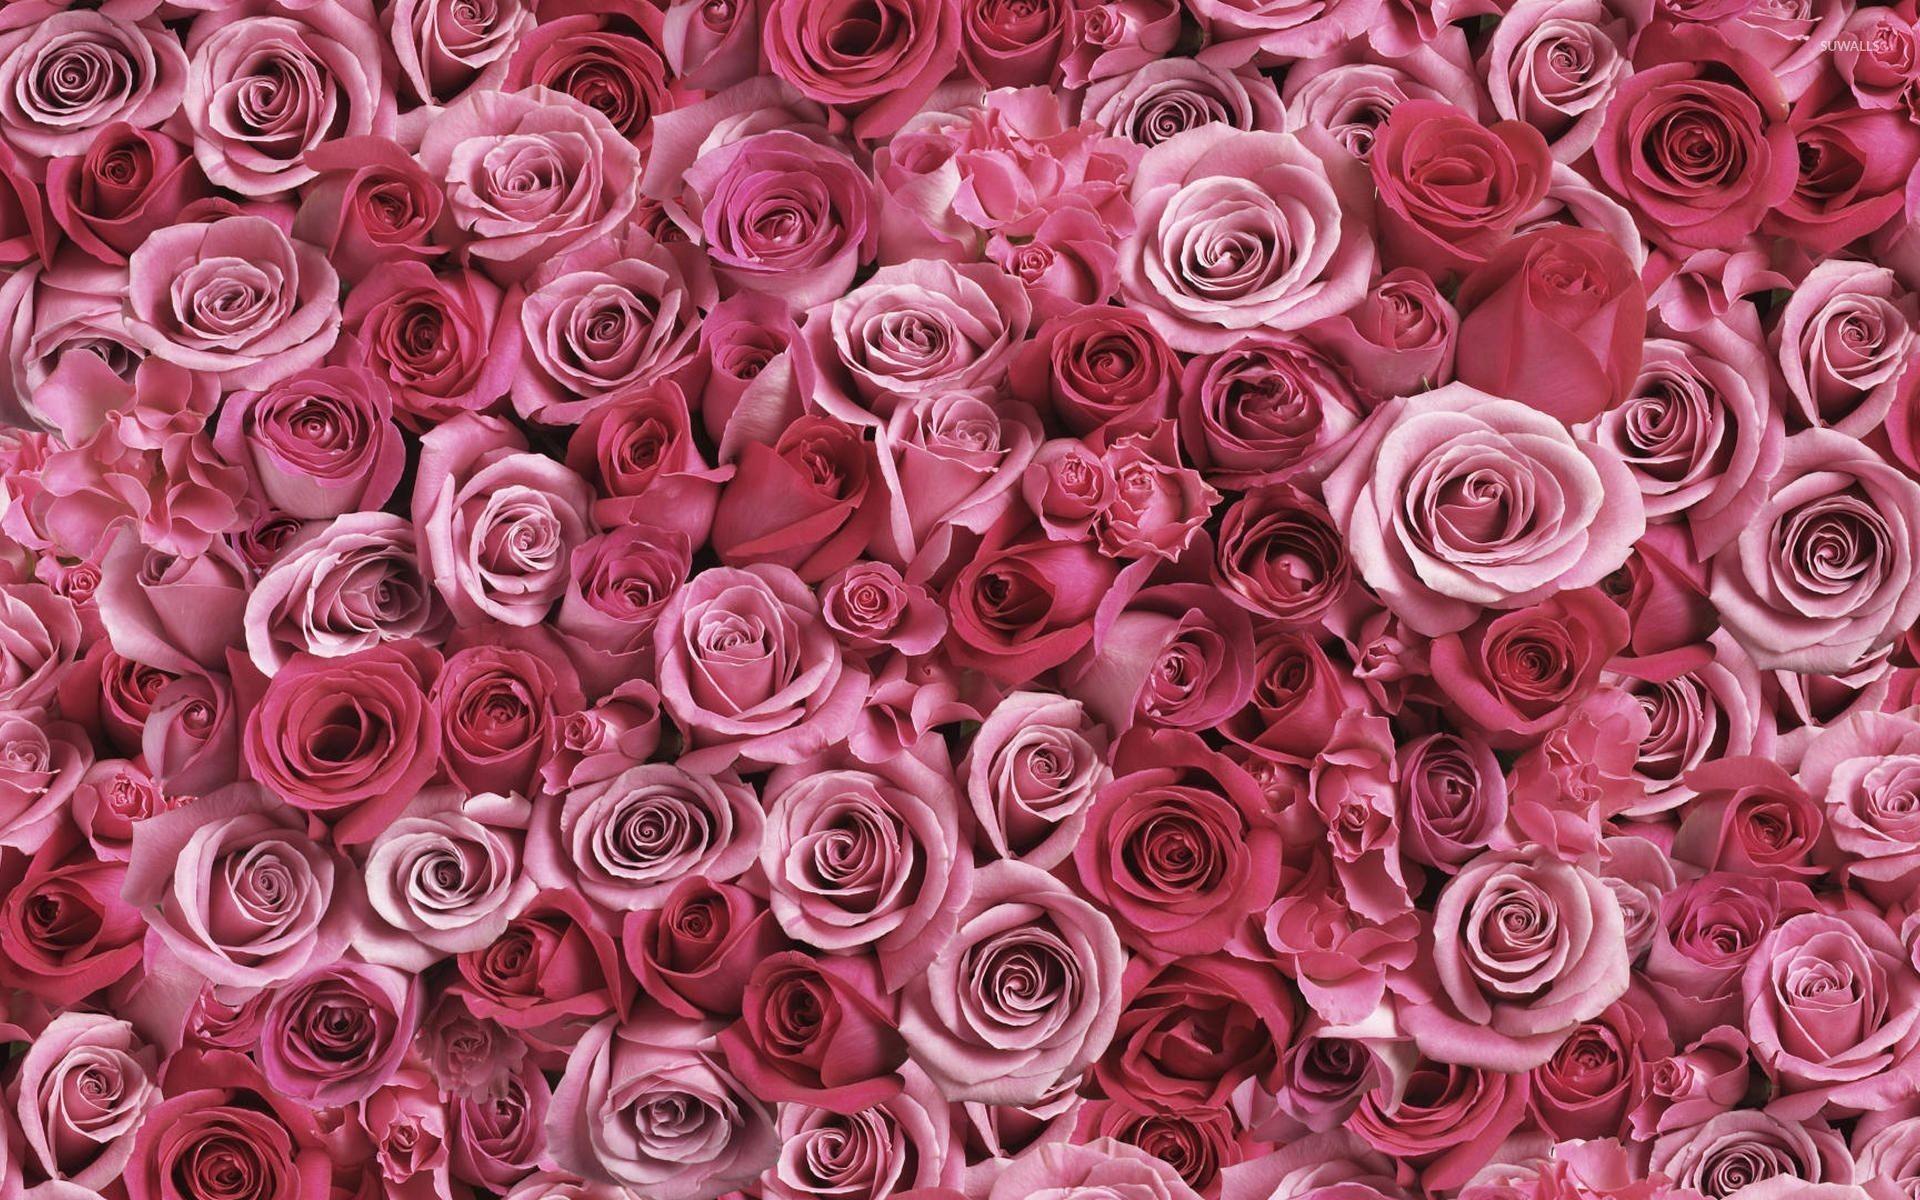 Res: 1920x1200, Pink Rose Wallpaper Desktop Background ~ Desktop Wallpaper Box